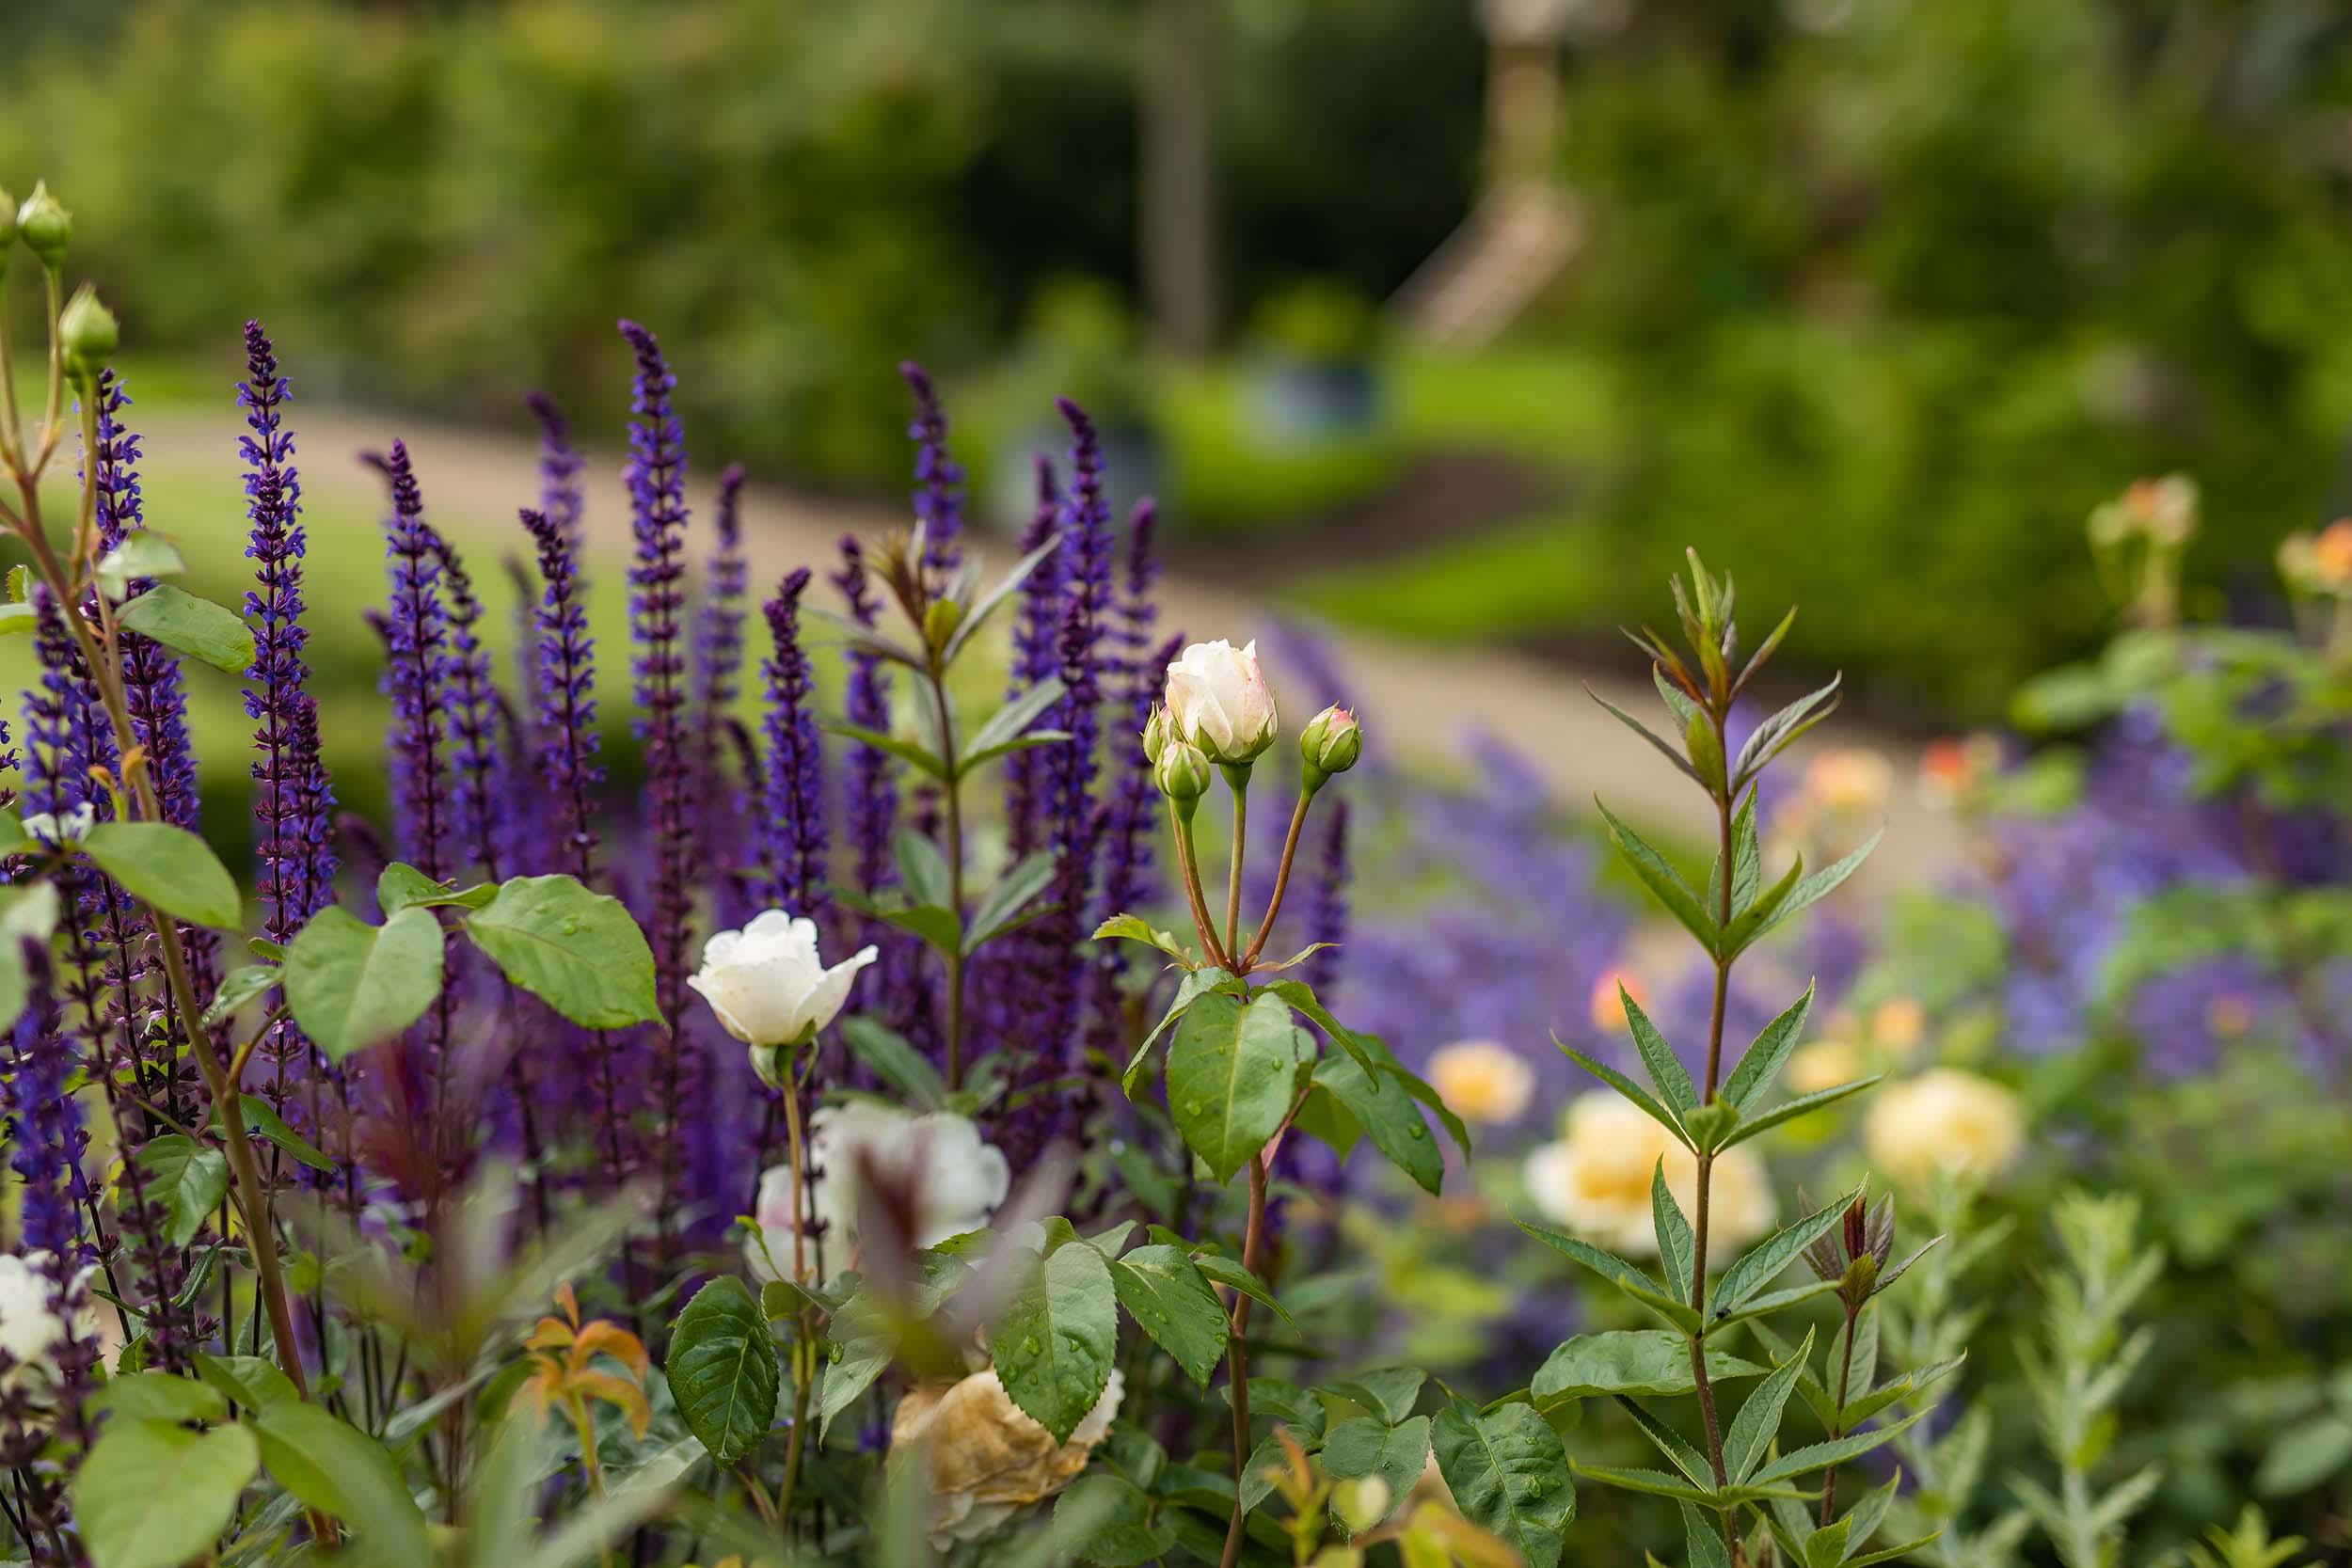 Nicholsons Garden - Lockdown For The Grandchildren 2